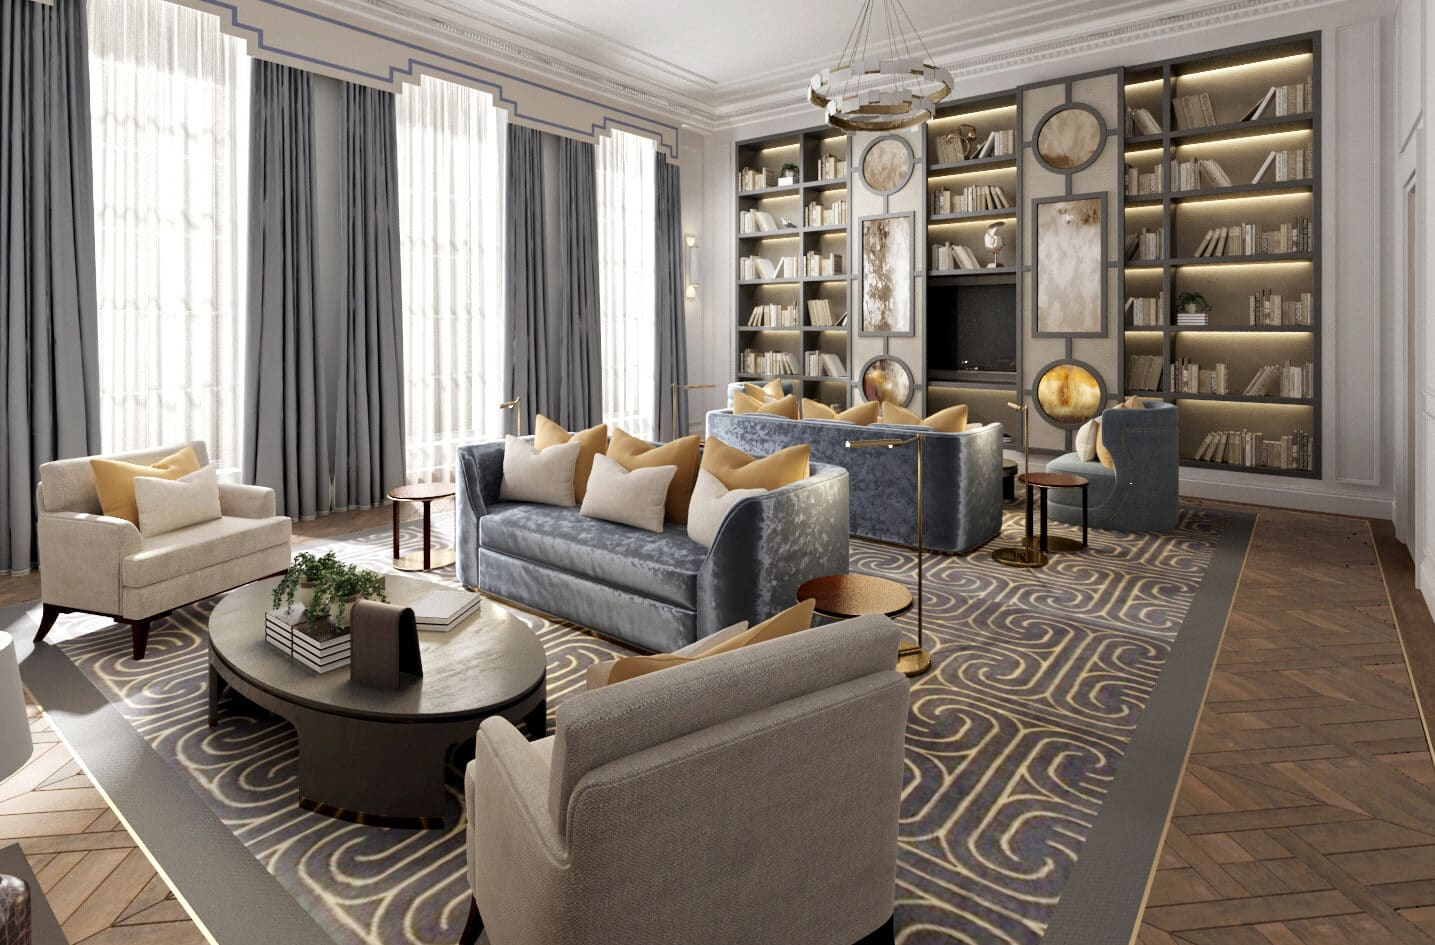 Living room of luxury london home